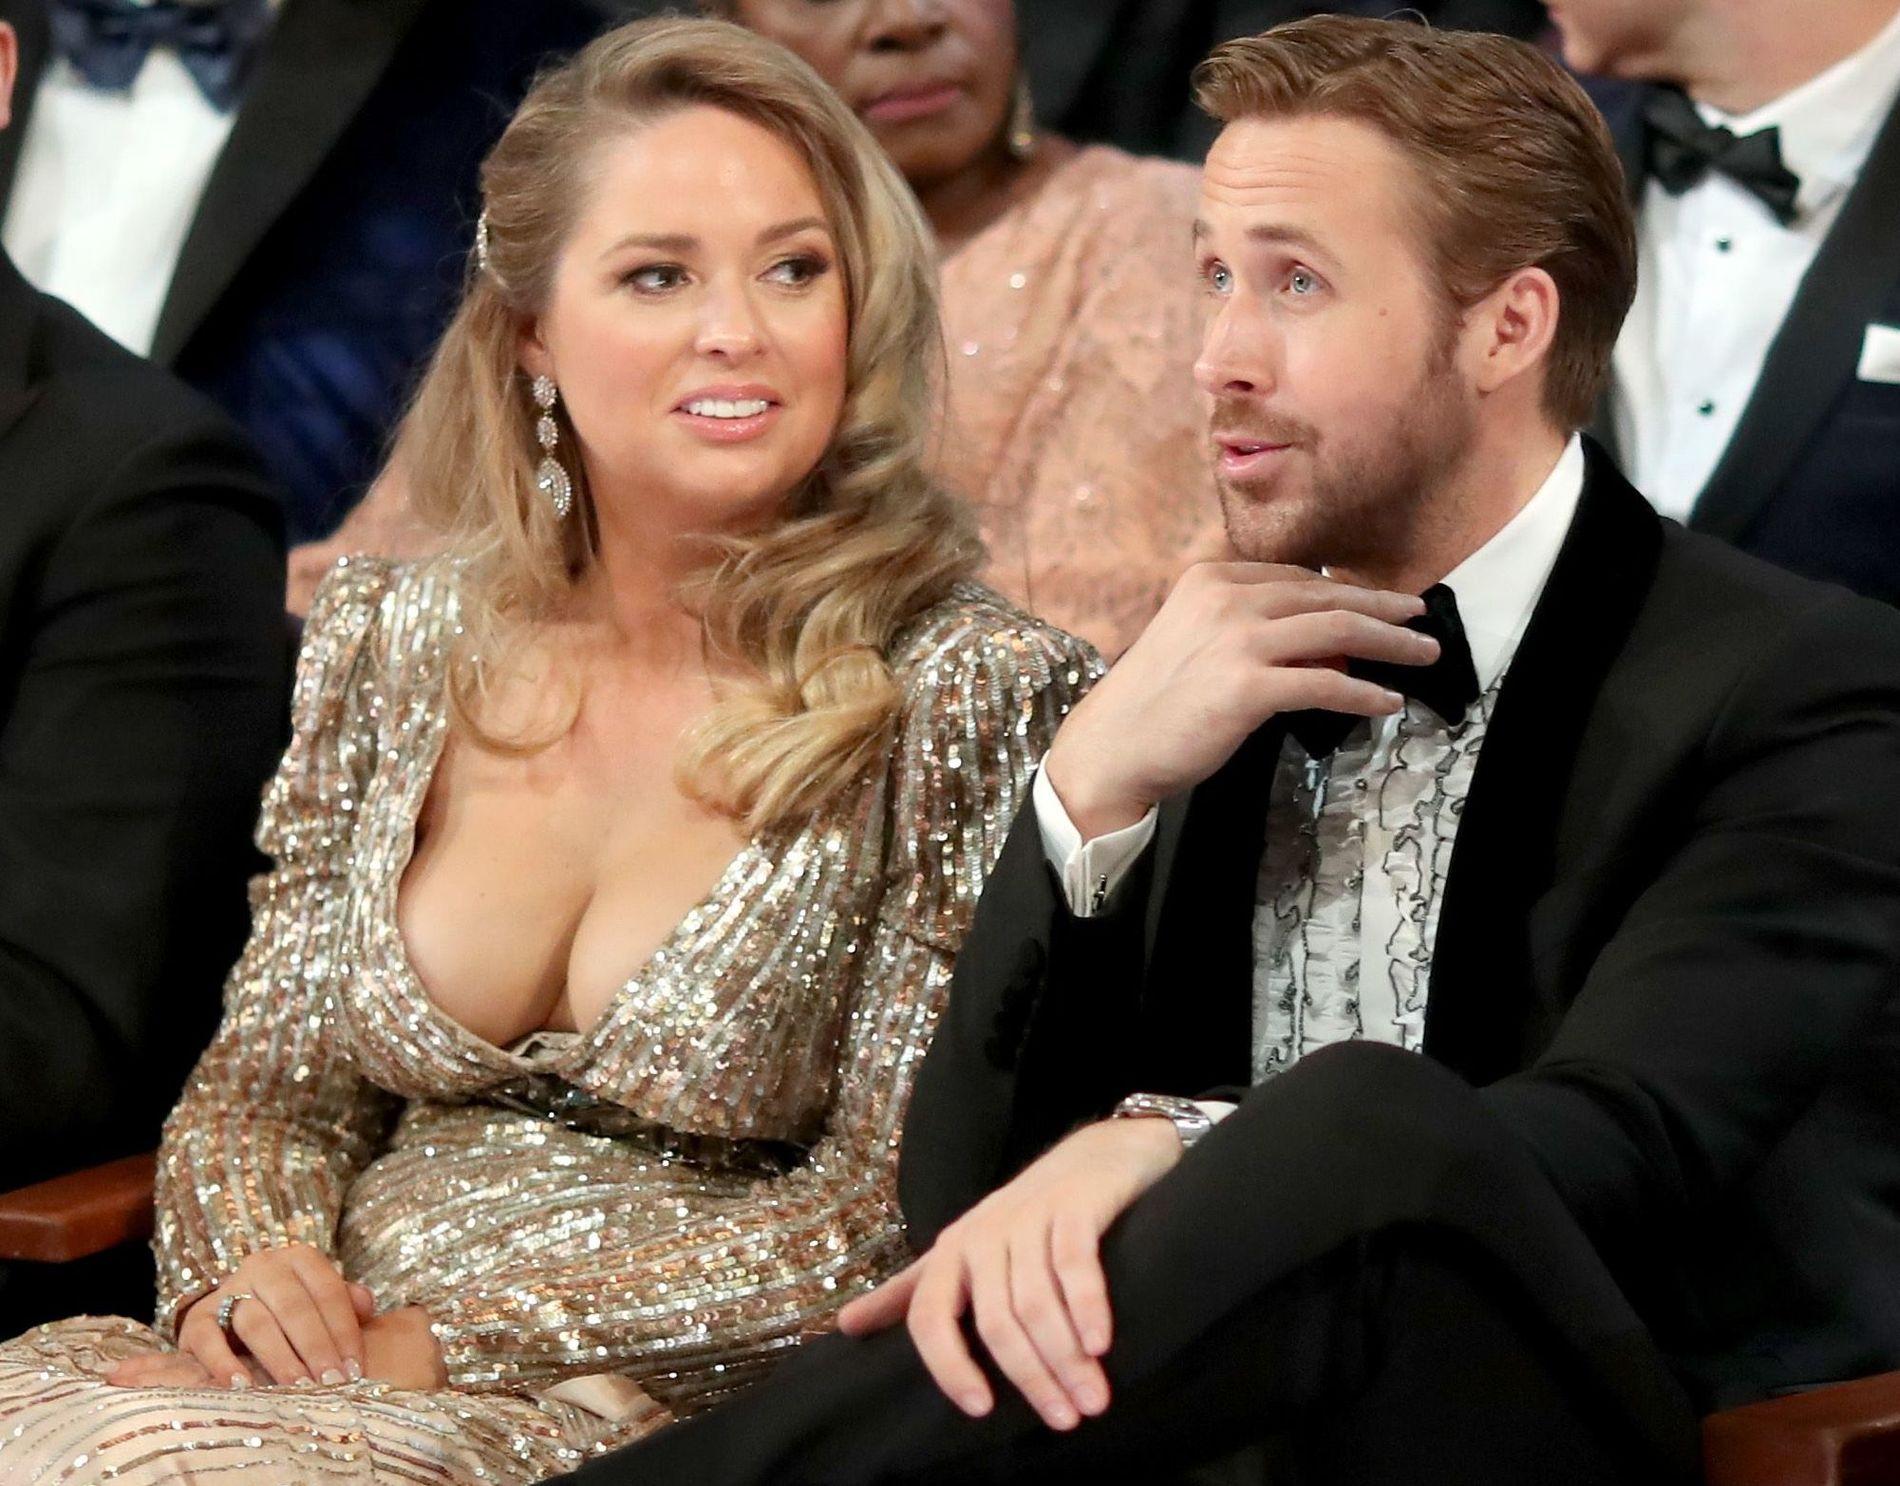 SØSTEREN: Mandi Gosling var Ryan Goslings følge til Oscar-gallaen søndag.